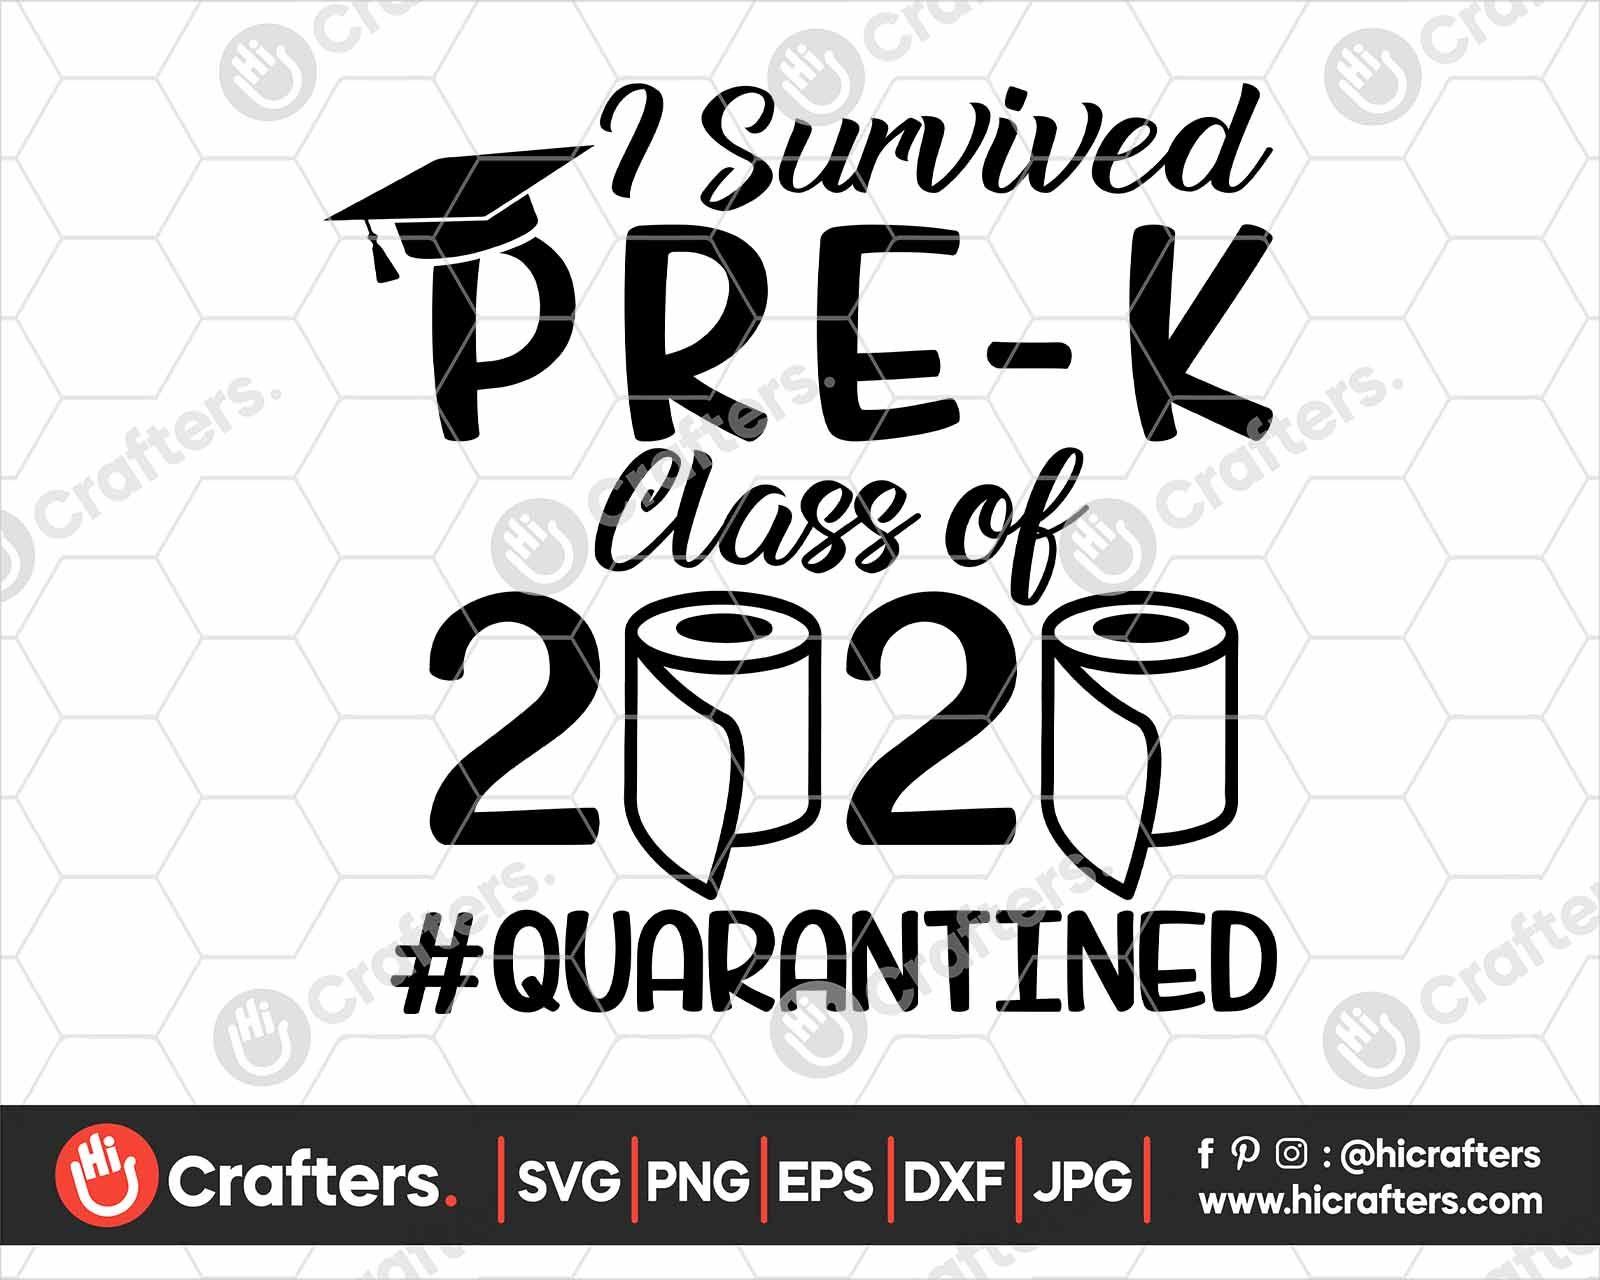 I Survived Pre K Quarantine Svg Class Of 2020 Svg 2020 Toilet Paper Svg Prek 2020 Graduation Svg Vozeli Com